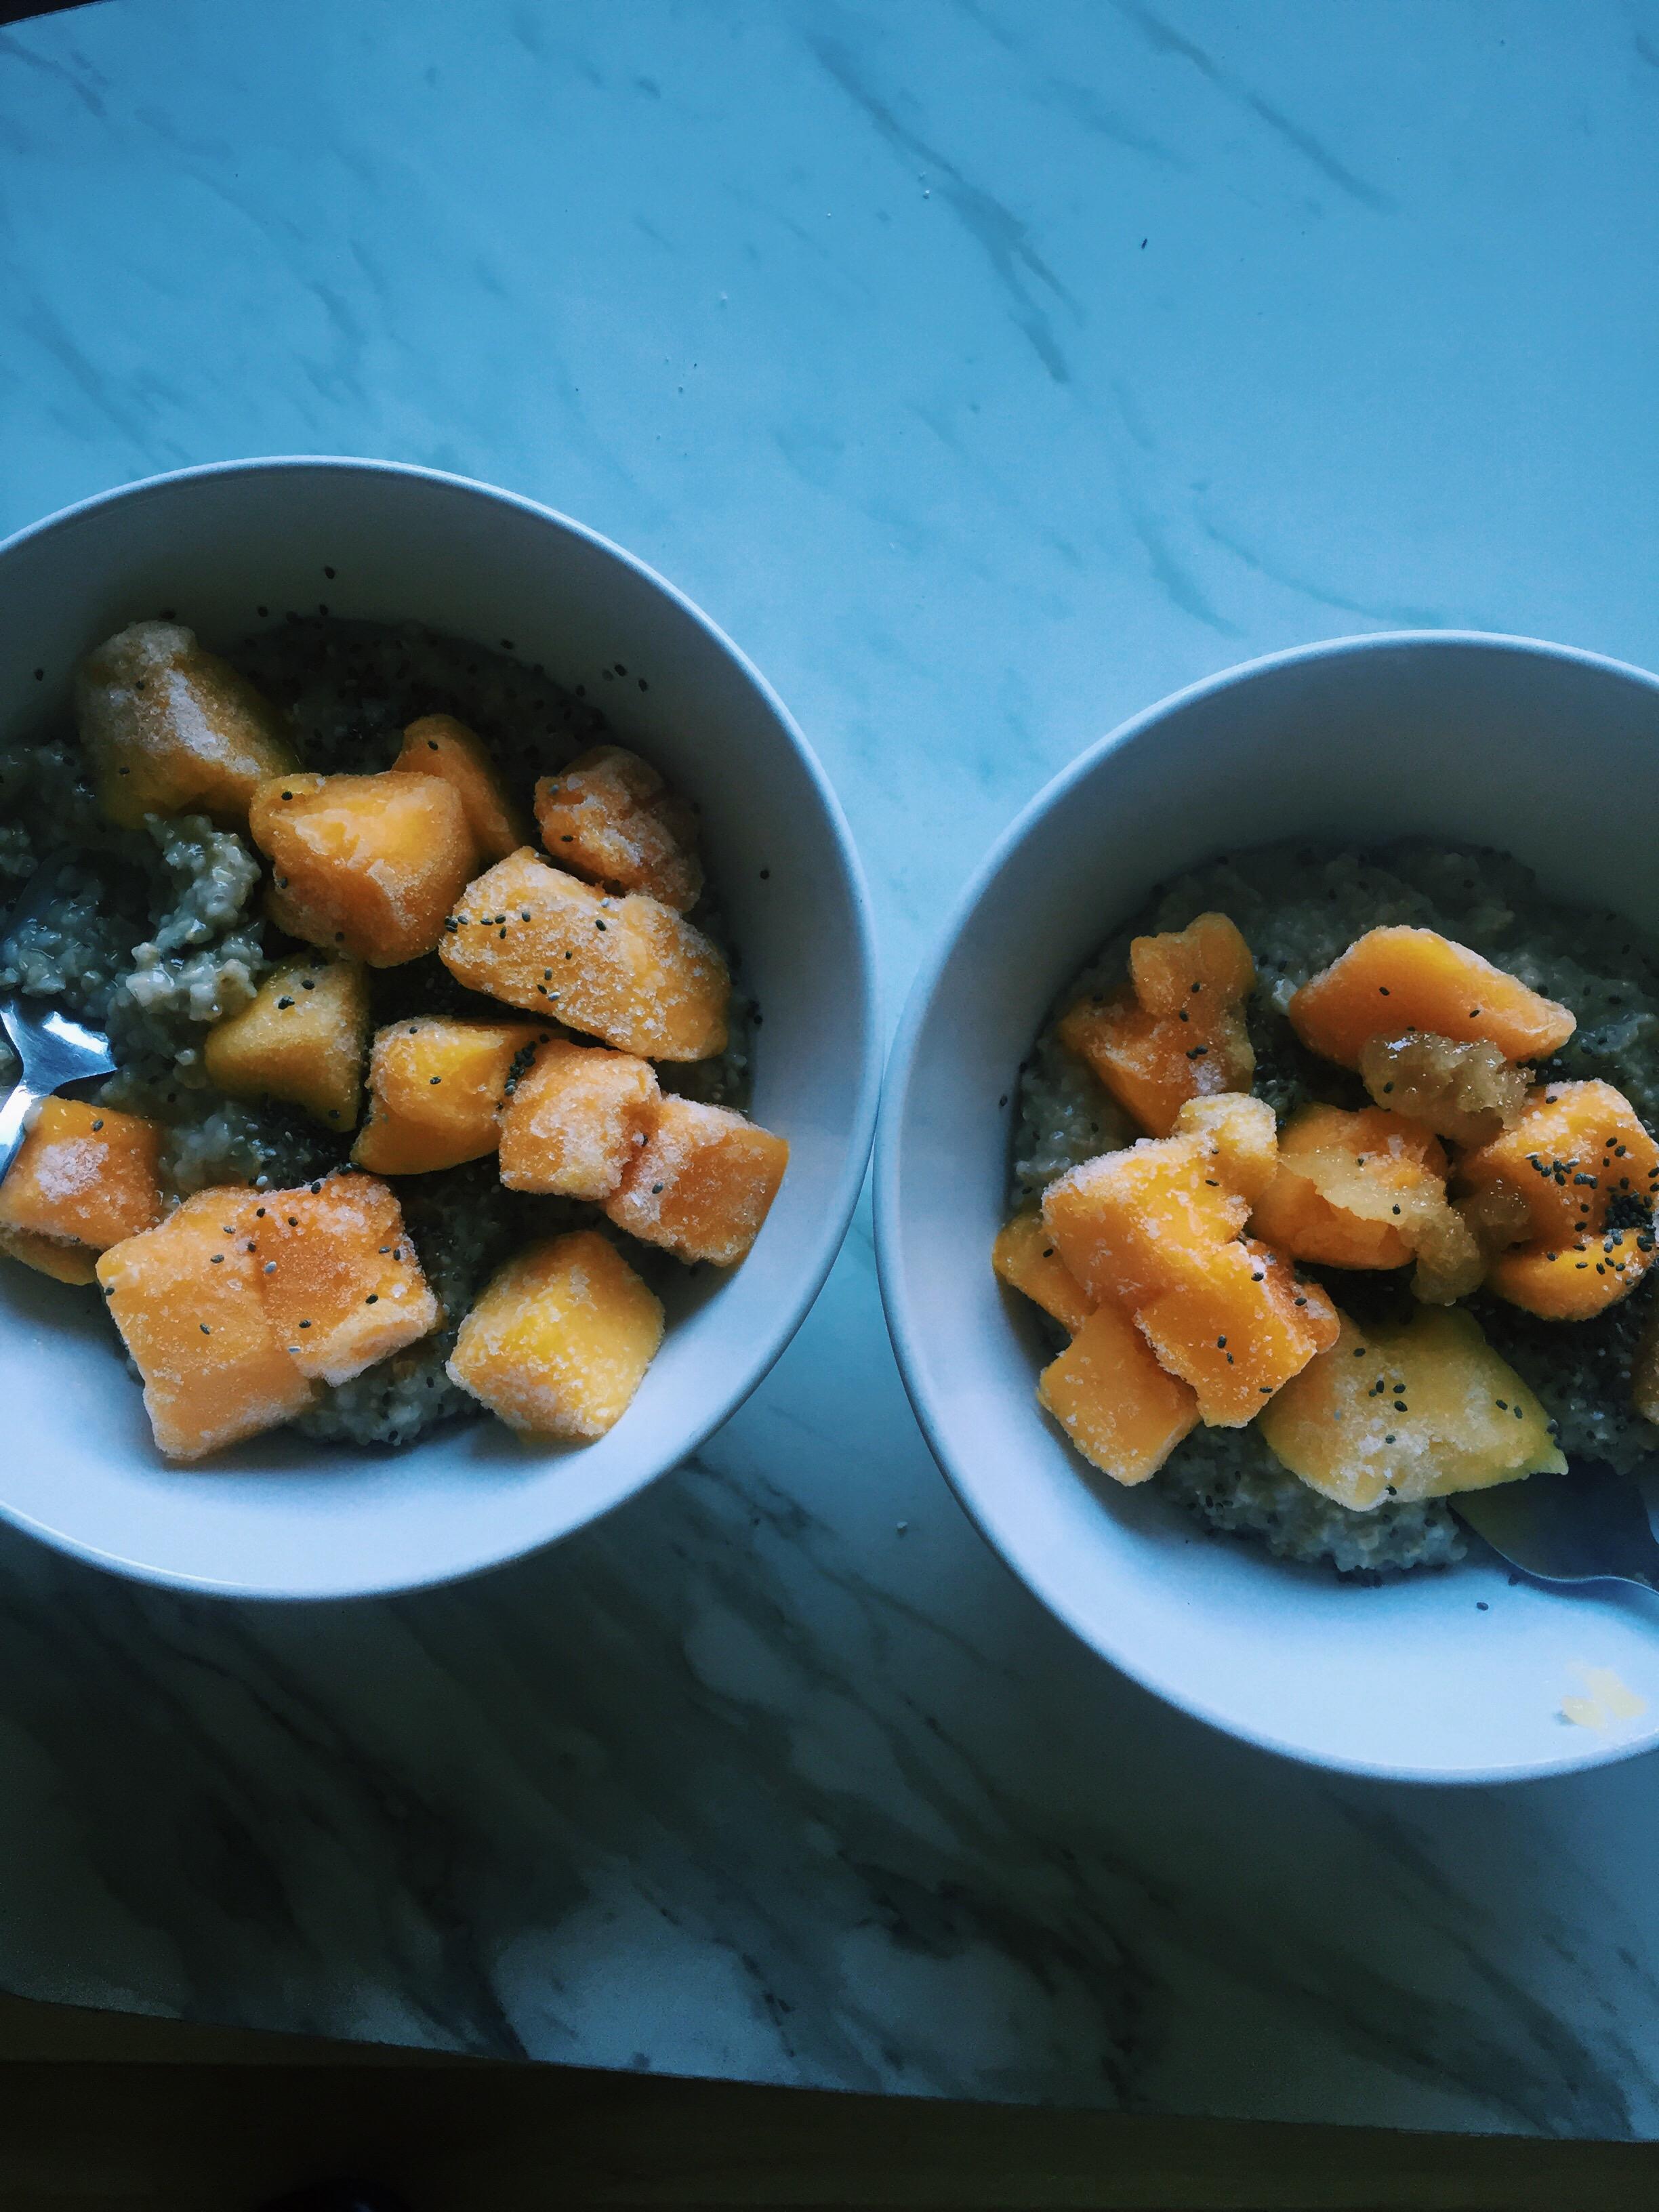 Breakfast: Steel cut oats, mango, chia seeds, and rice milk.